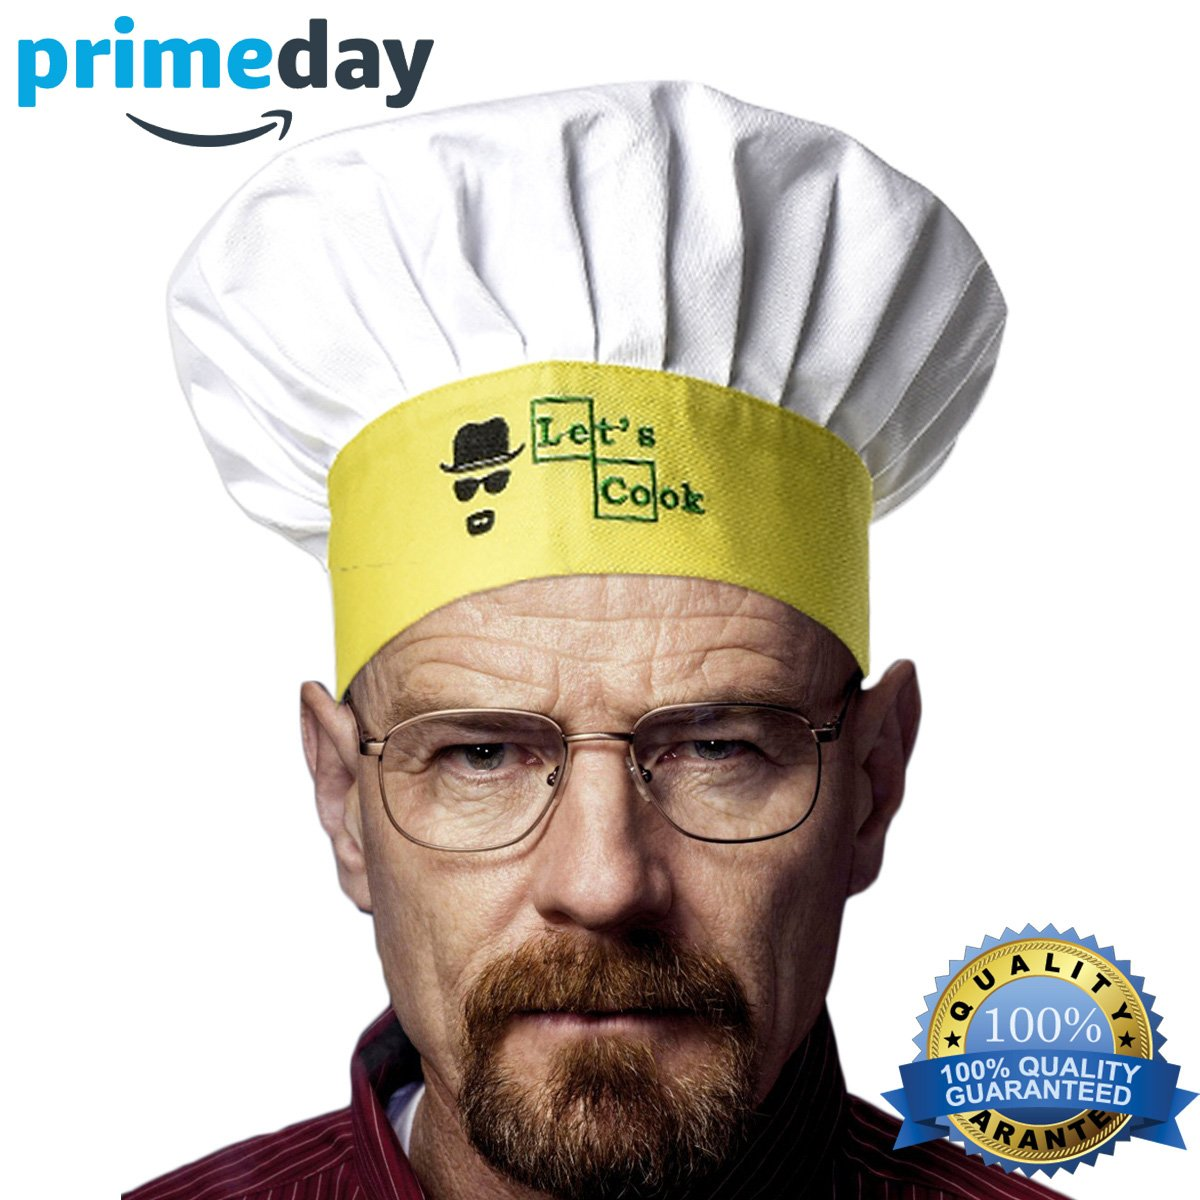 Famgem Chef Hat Kitchen Adult Cap - Adjustable for Men, Women, Kids, Grill, Cooking, Baking, BBQ, Outdoor/100% Cotton